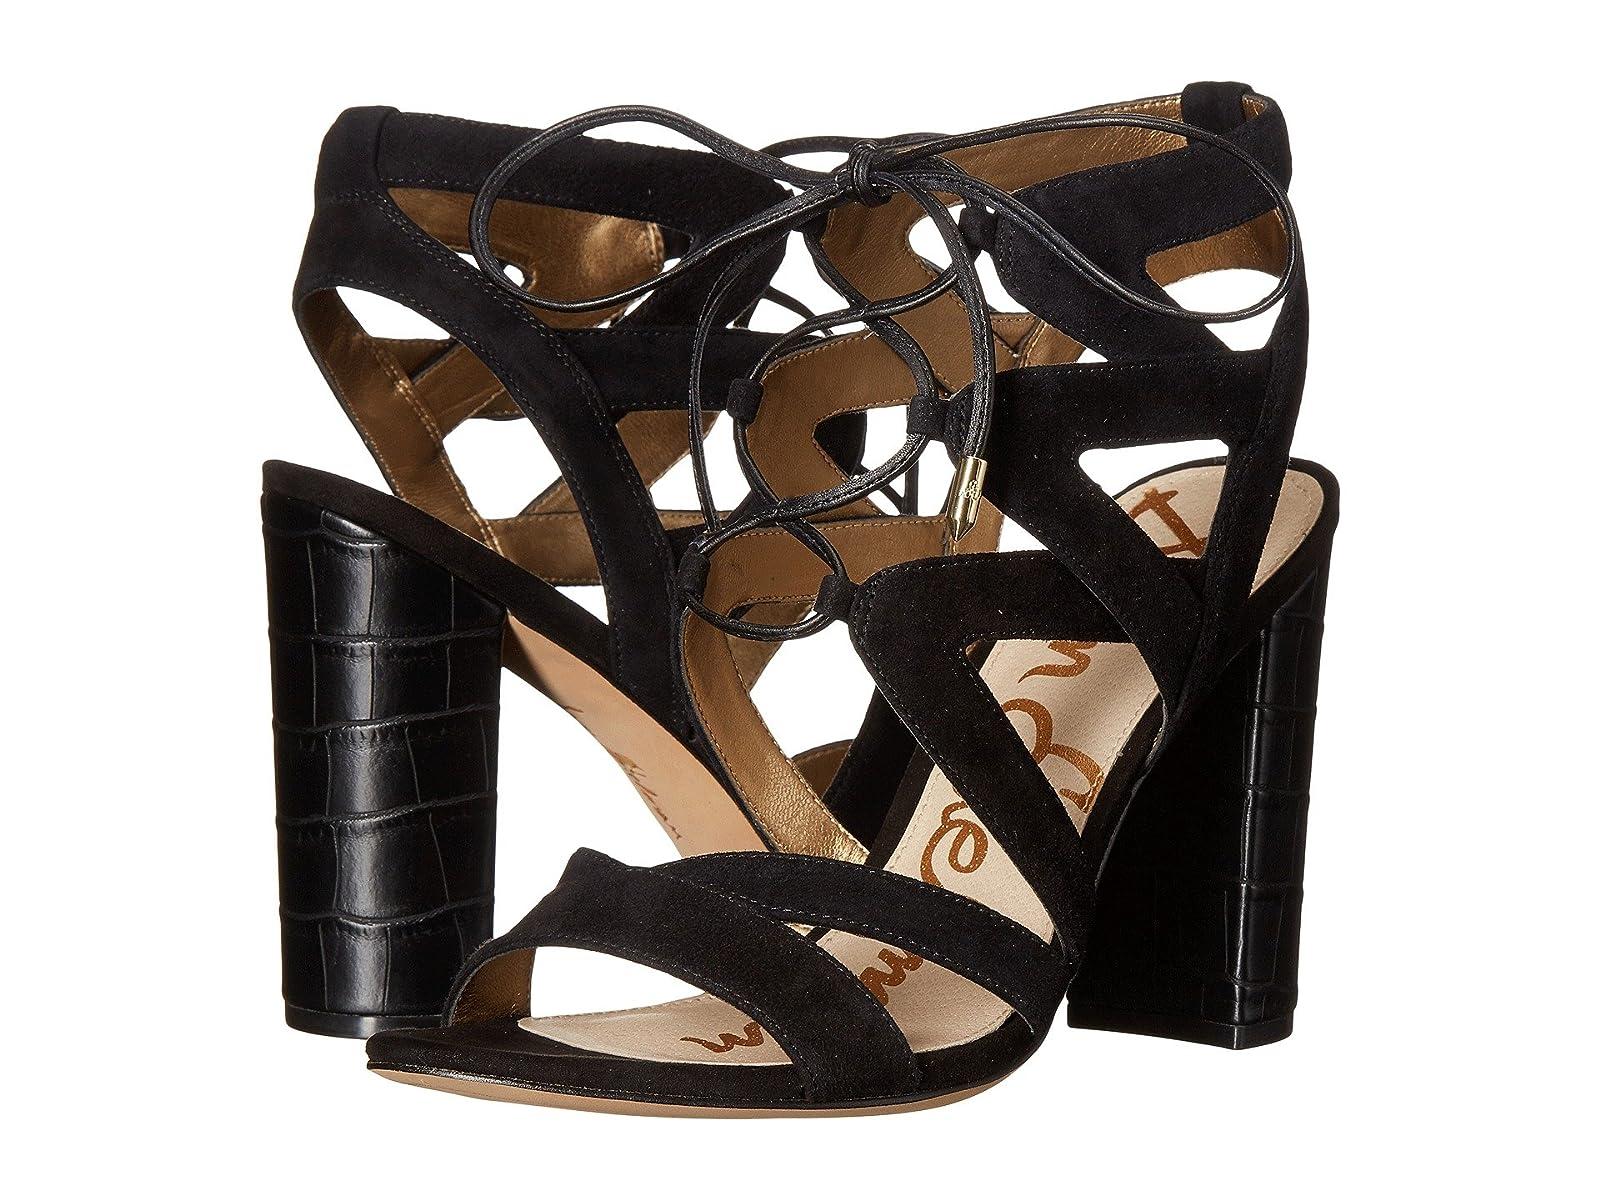 Sam Edelman YardleyCheap and distinctive eye-catching shoes